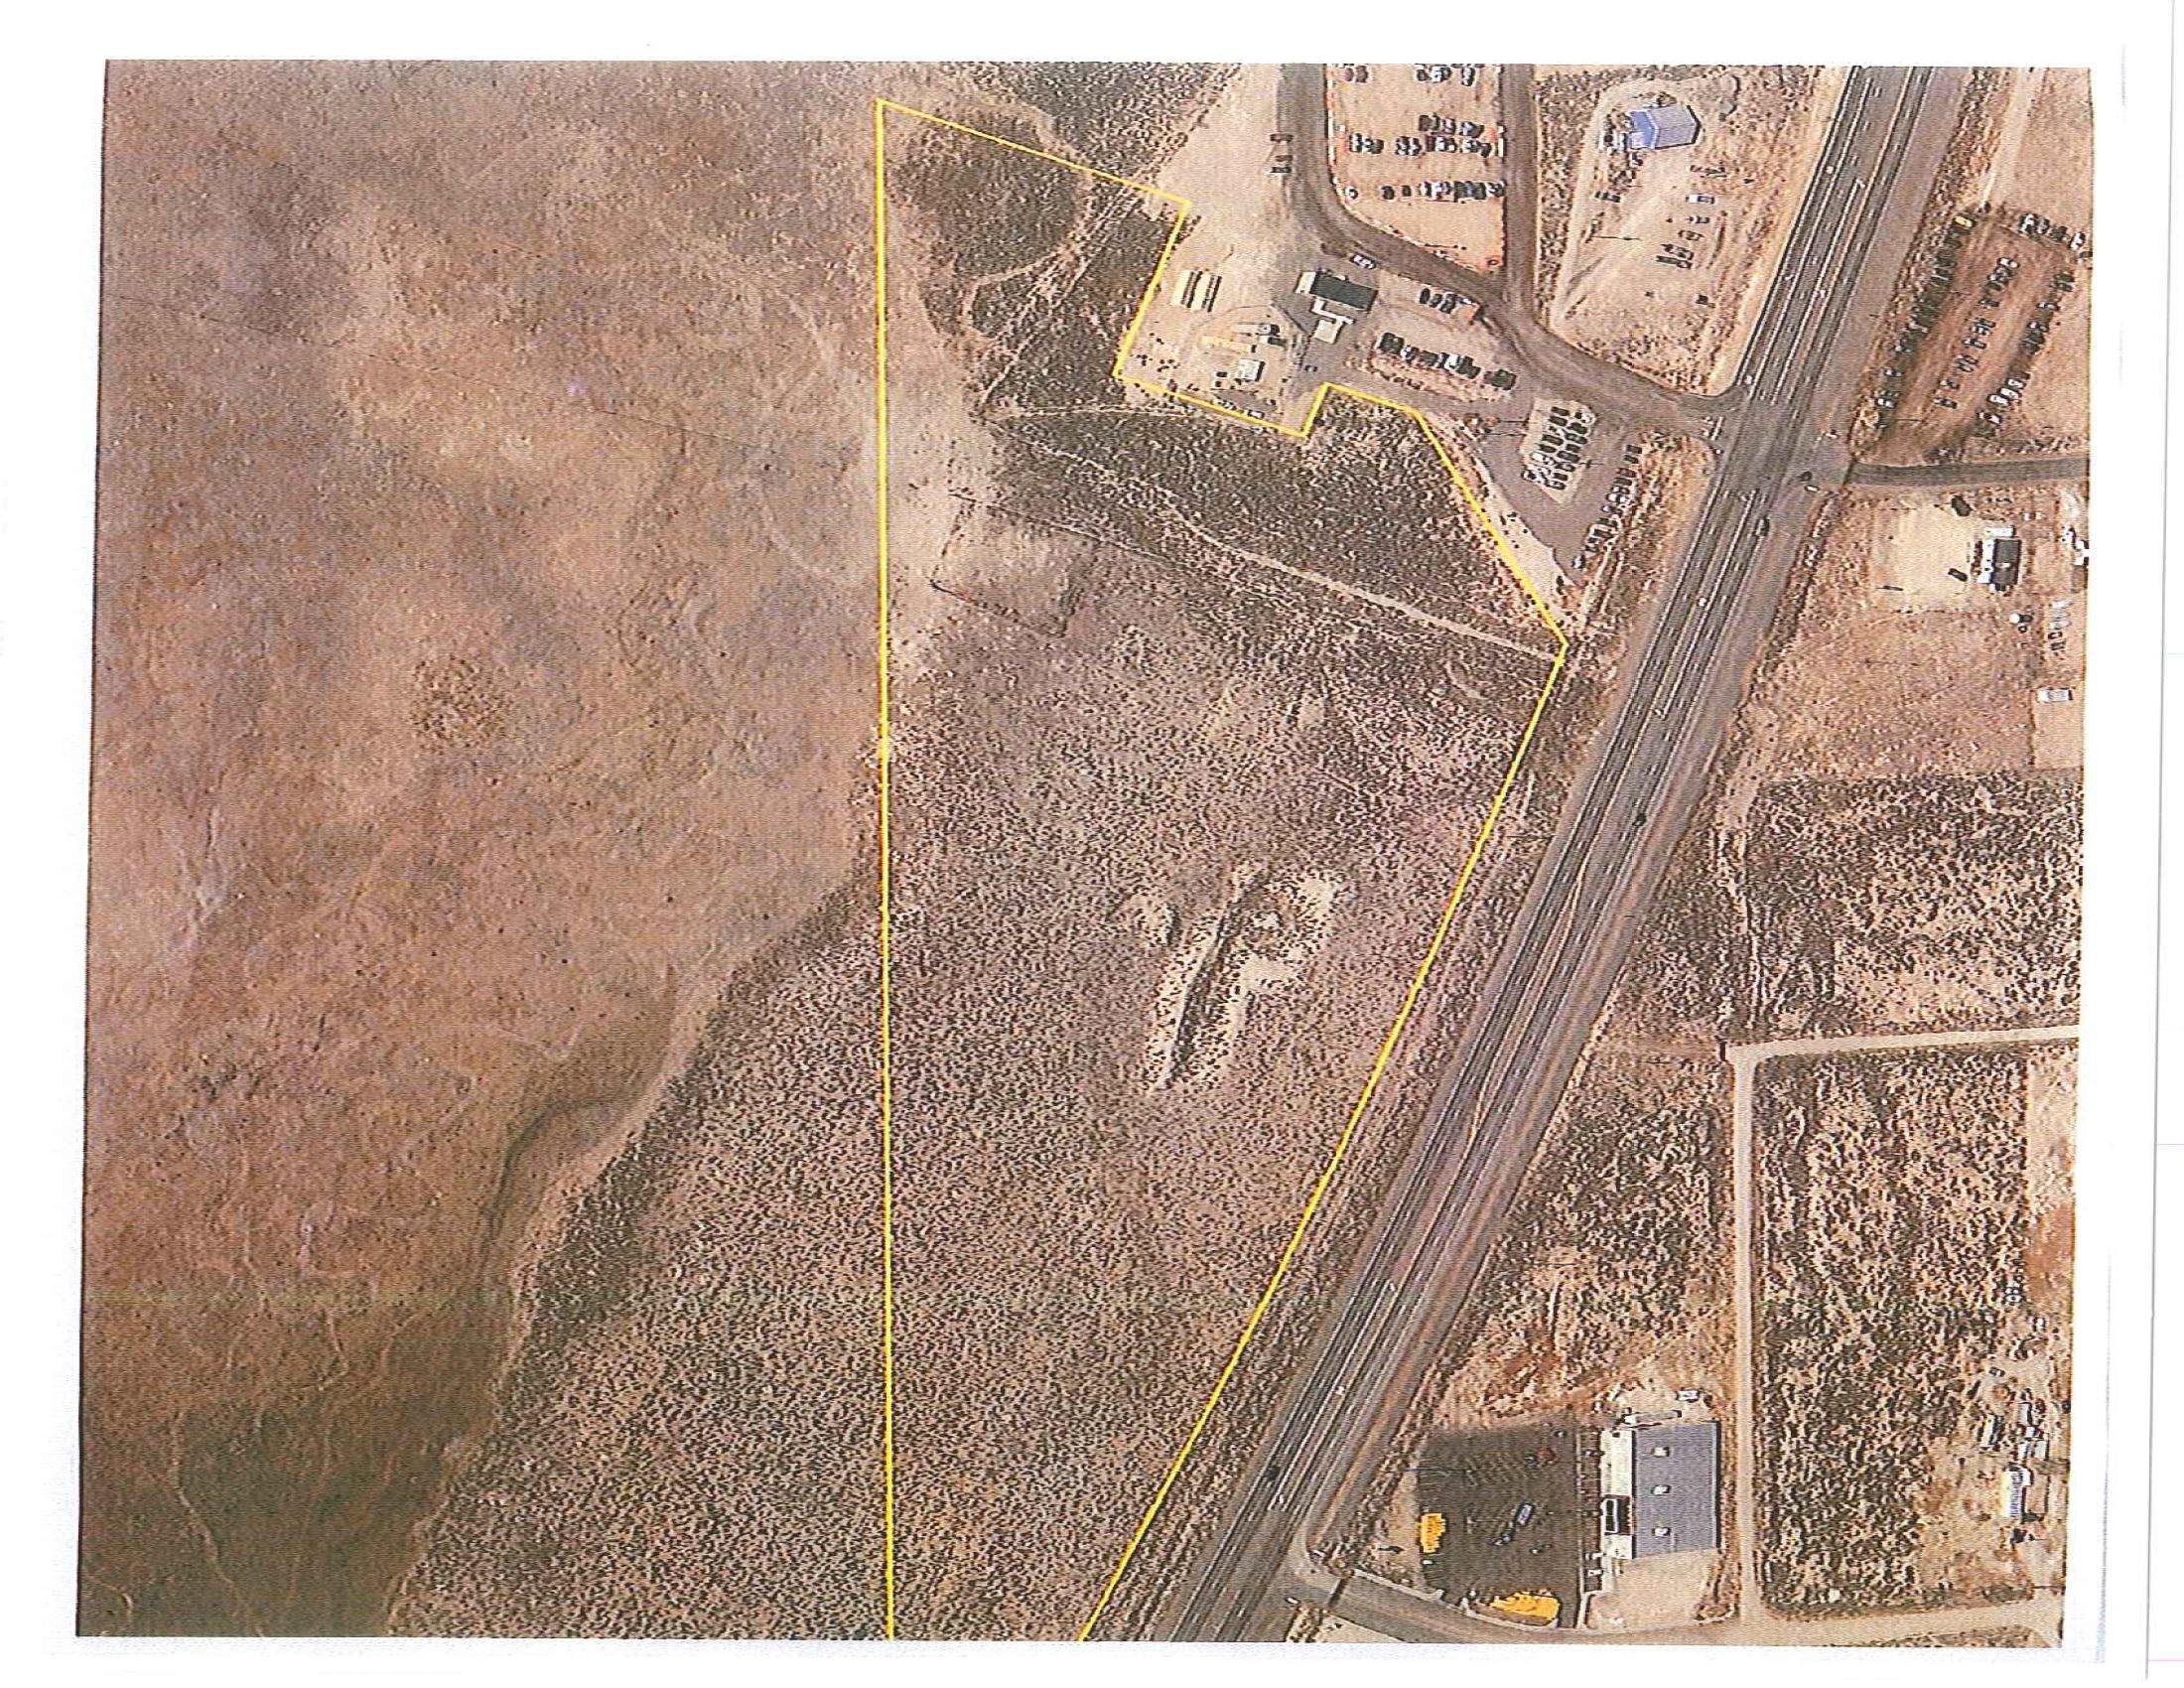 TBD Lamoille HWY, Spring Creek, Nevada 89815